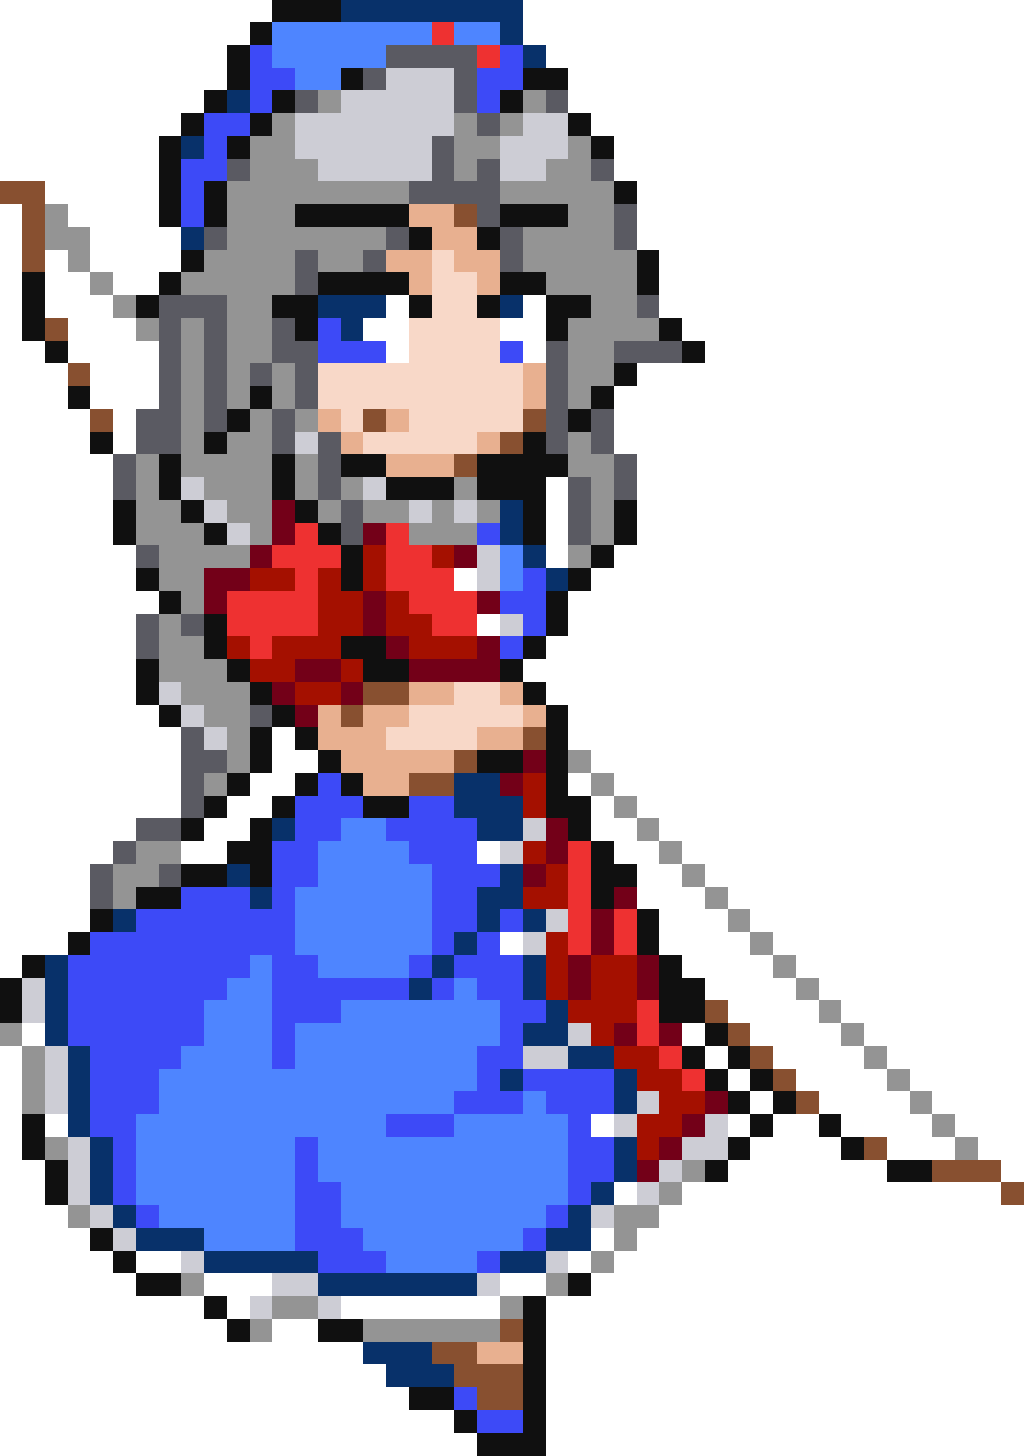 Pixelart Draw Anime Manga Colorbynumber Game Ninjapixel Pixel Art Art Apps Anime Pixel Art